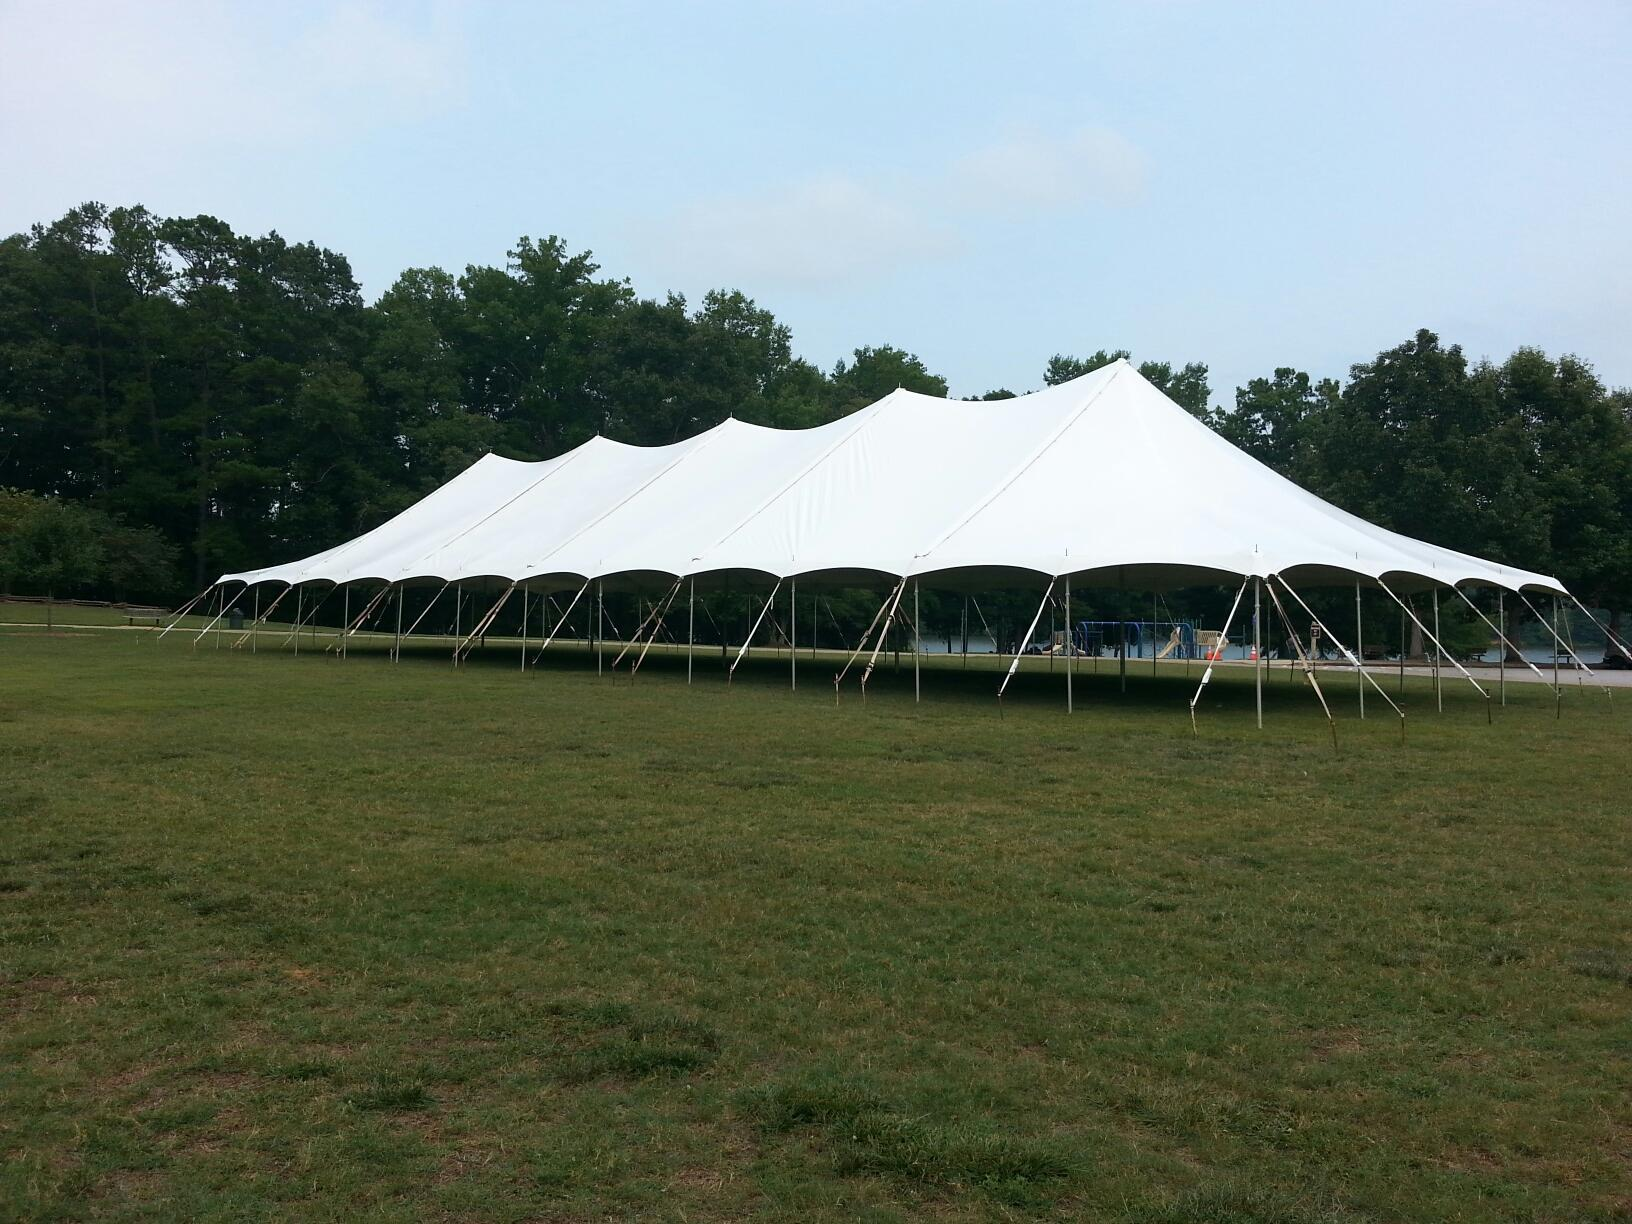 40x100-Pole-Tent